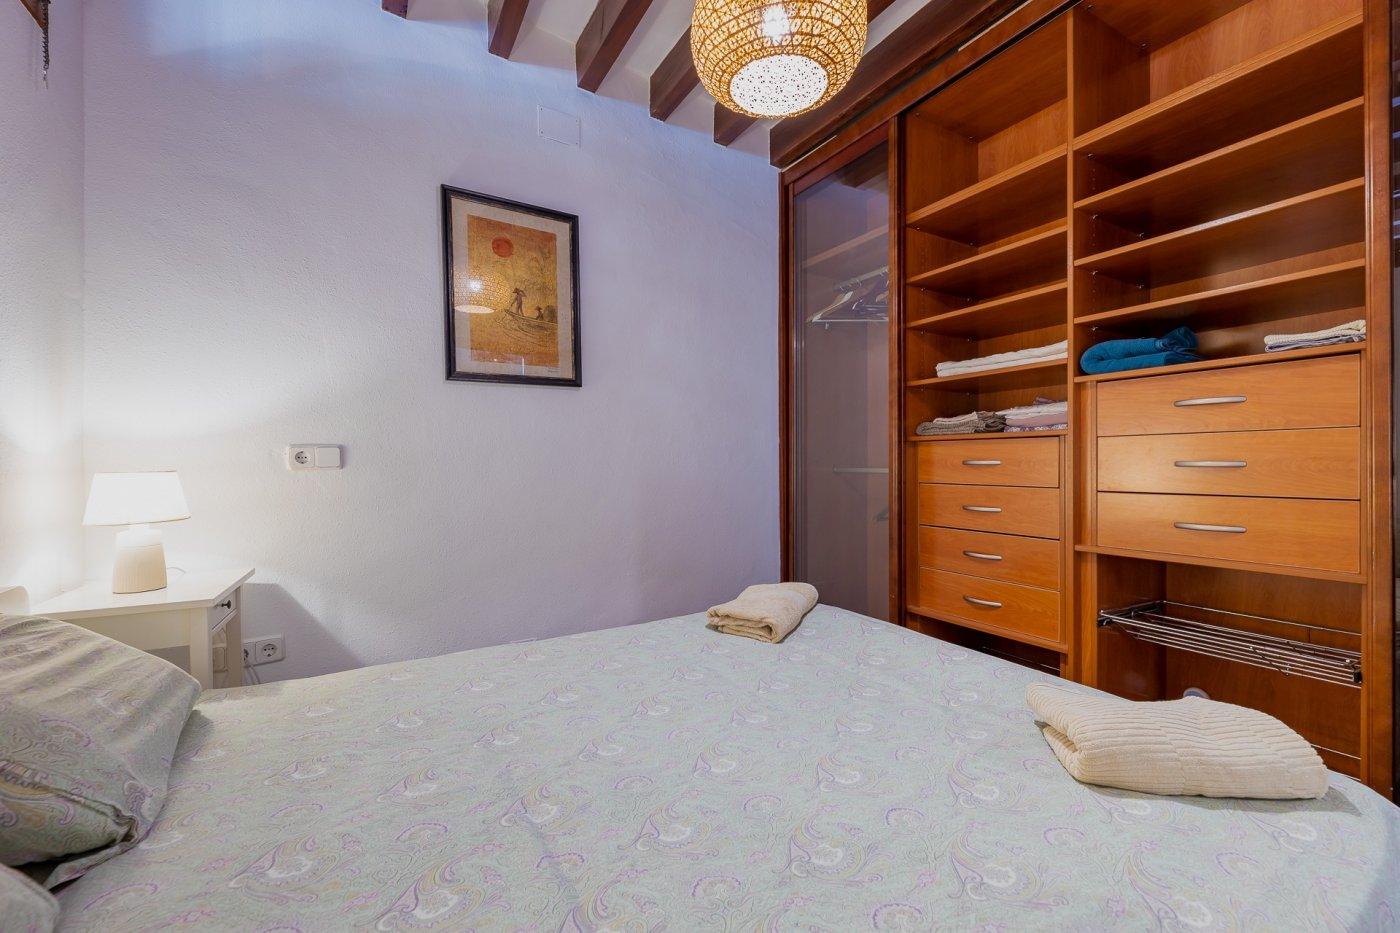 Espectacular apartamento en centro de palma - imagenInmueble27